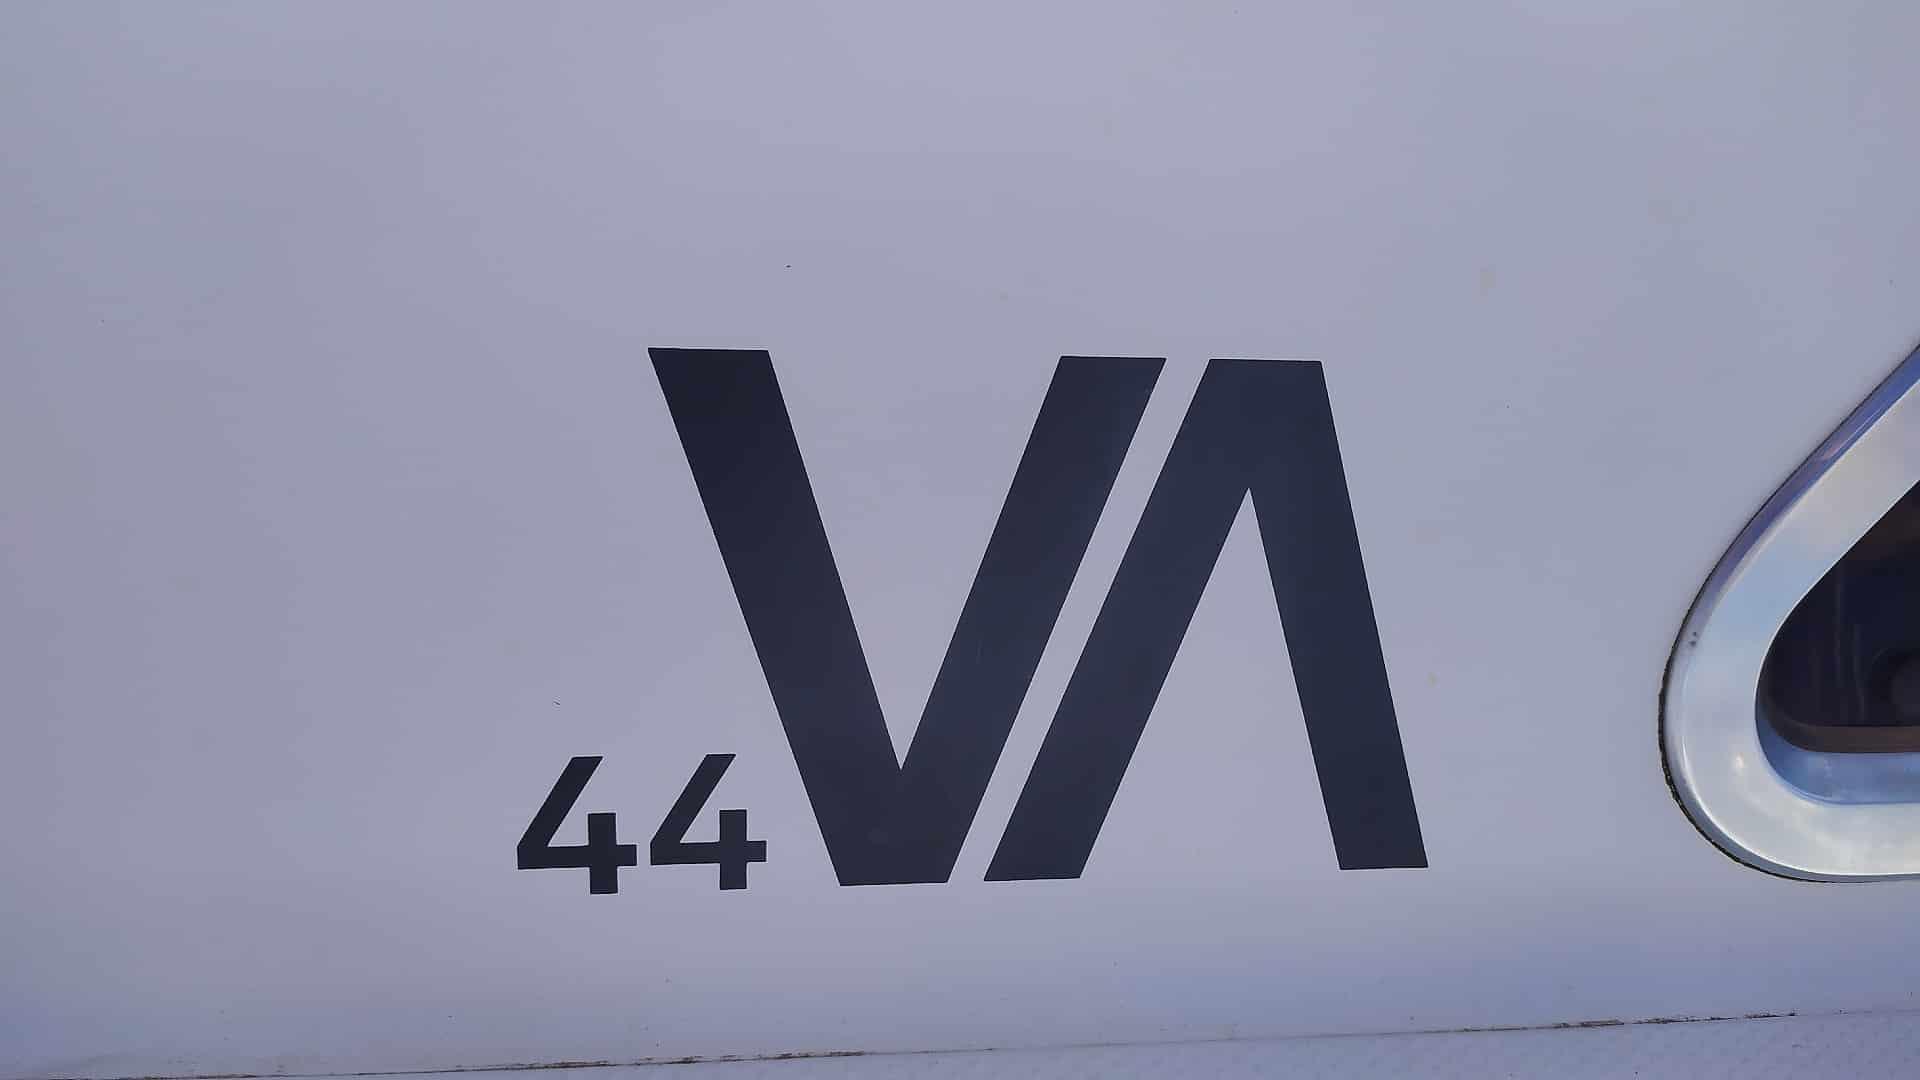 Lorelai-Dehler Varinata-44 logo